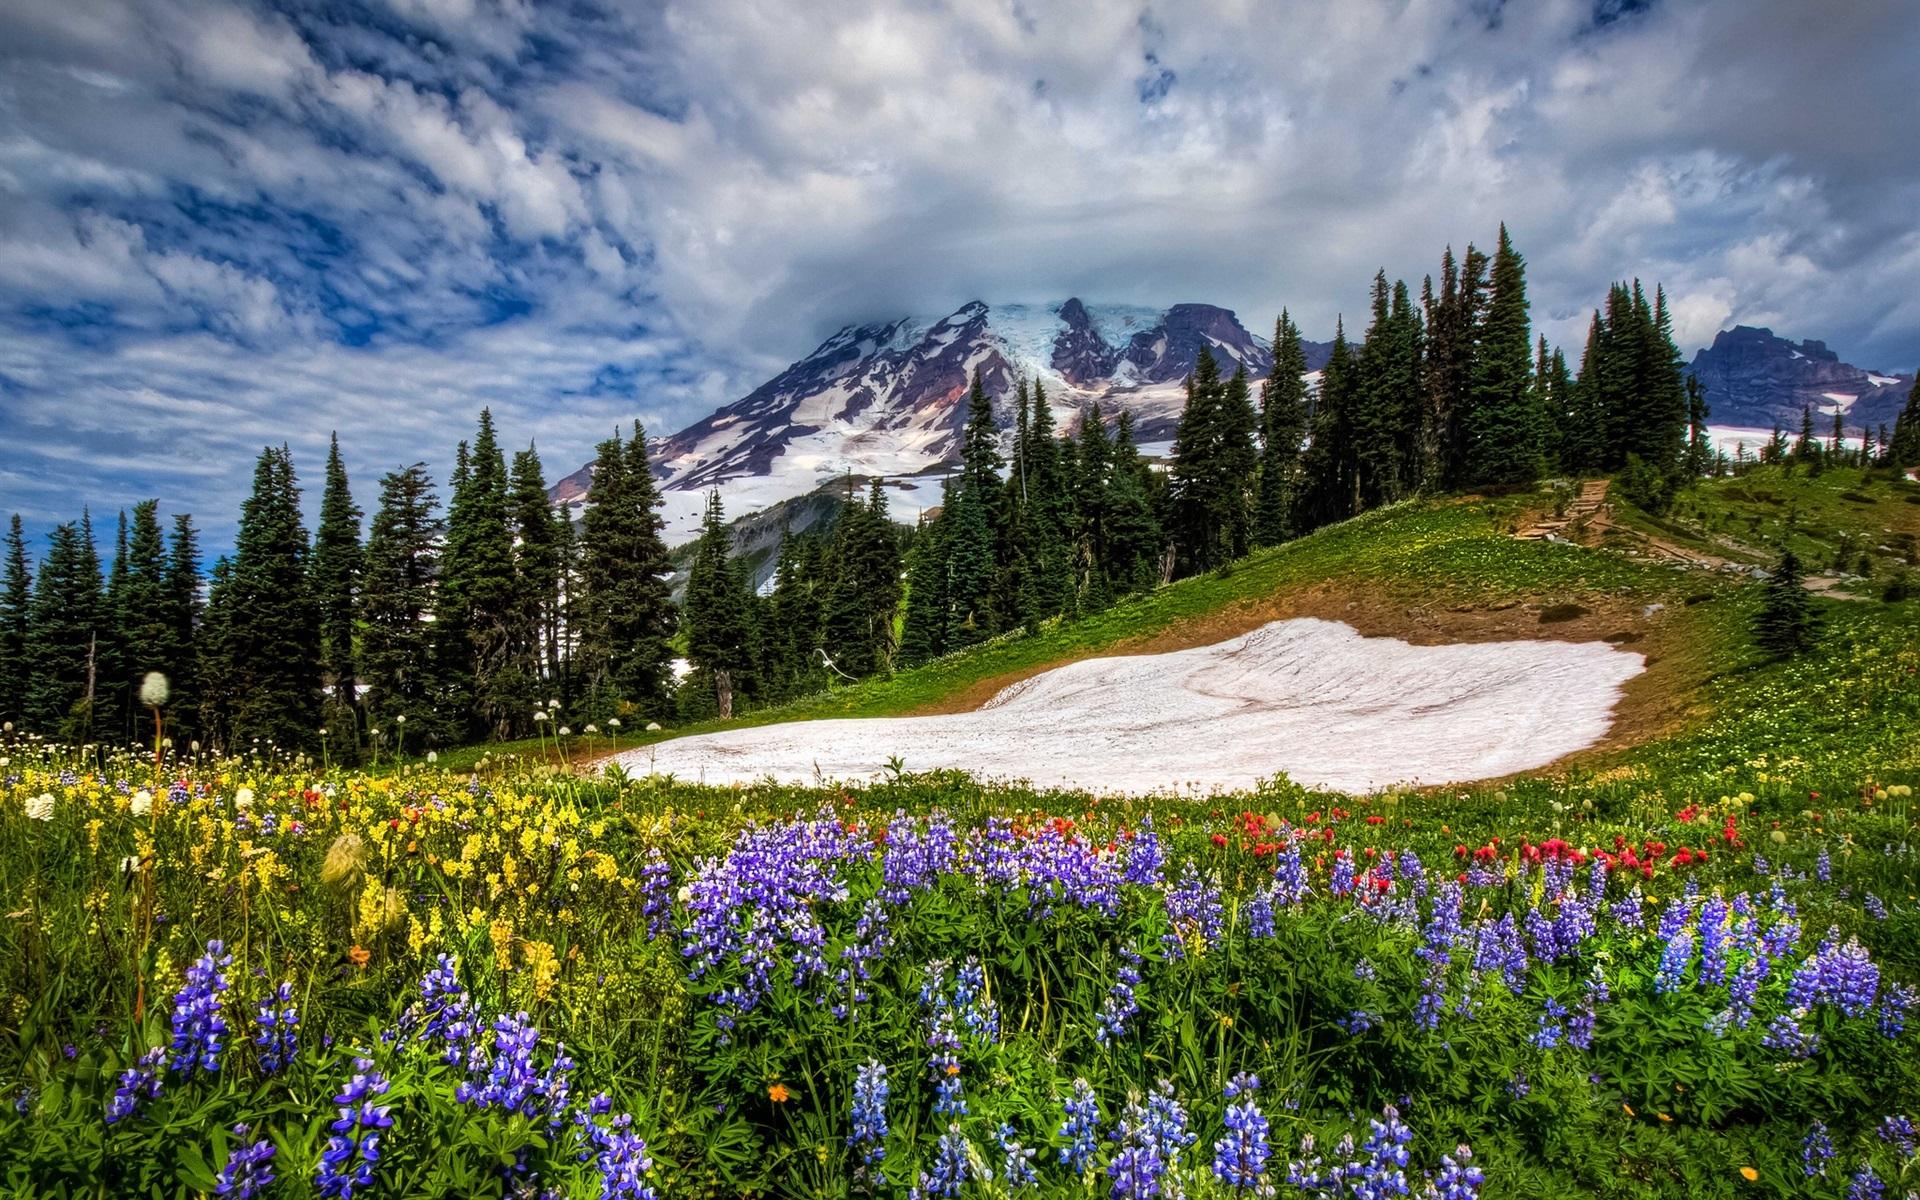 Mountains-flowers-sky-spring-grass_1920x1200.jpg